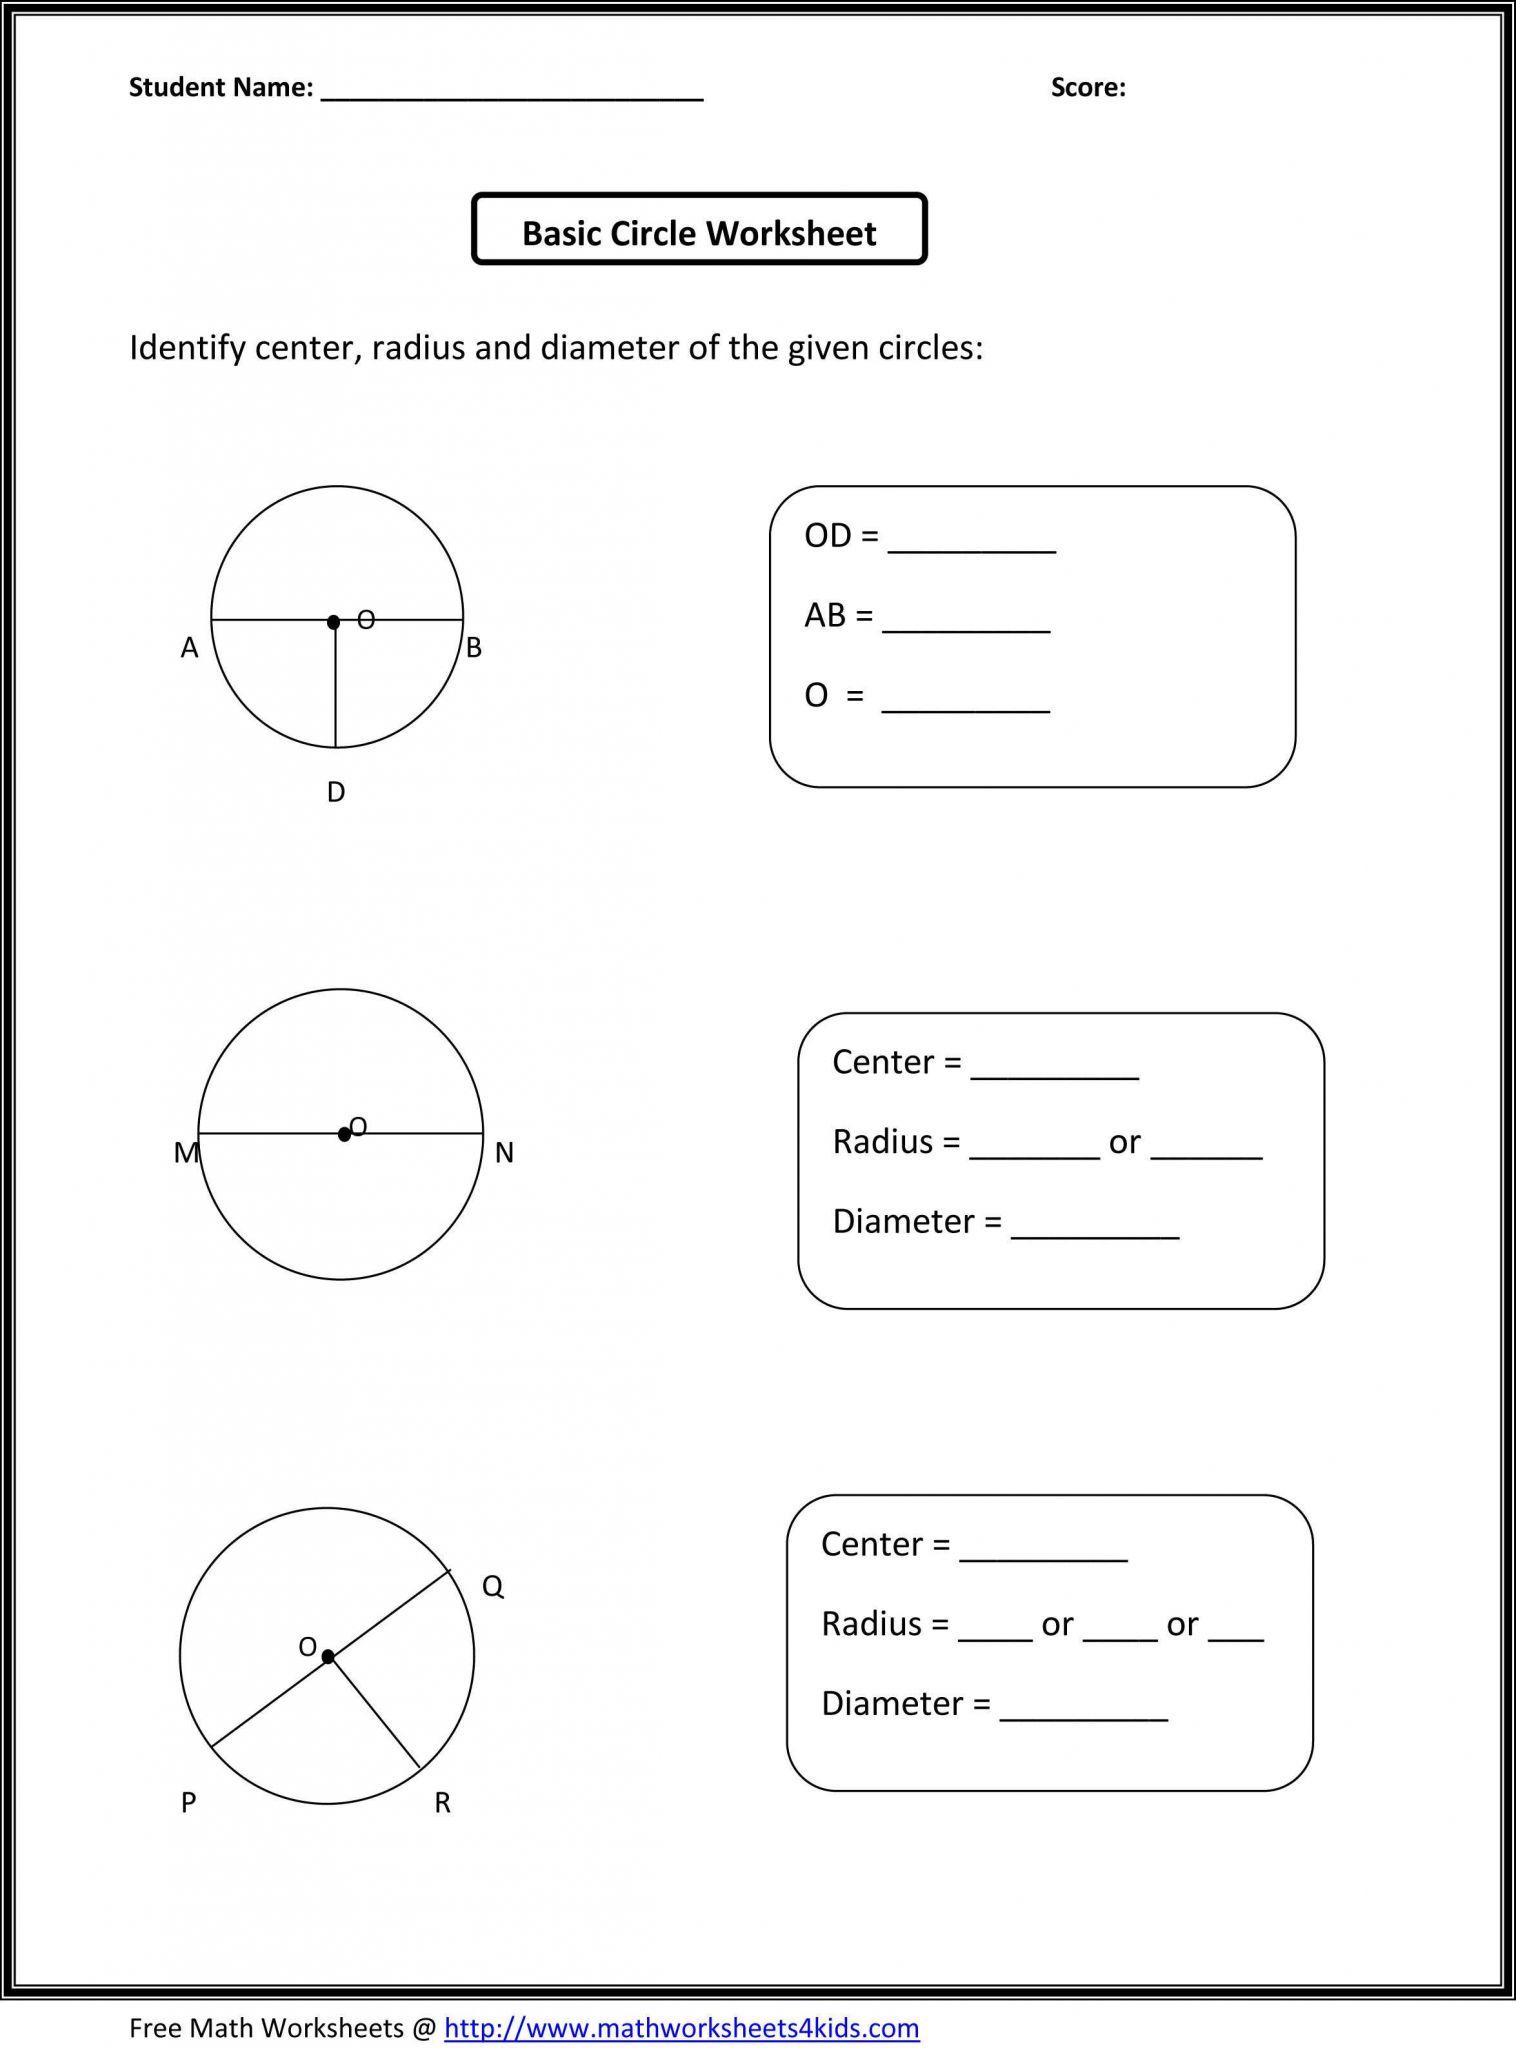 Subtracting Integers Worksheet with Integer Word Problems Worksheet Fresh Math Word Problems Worksheets